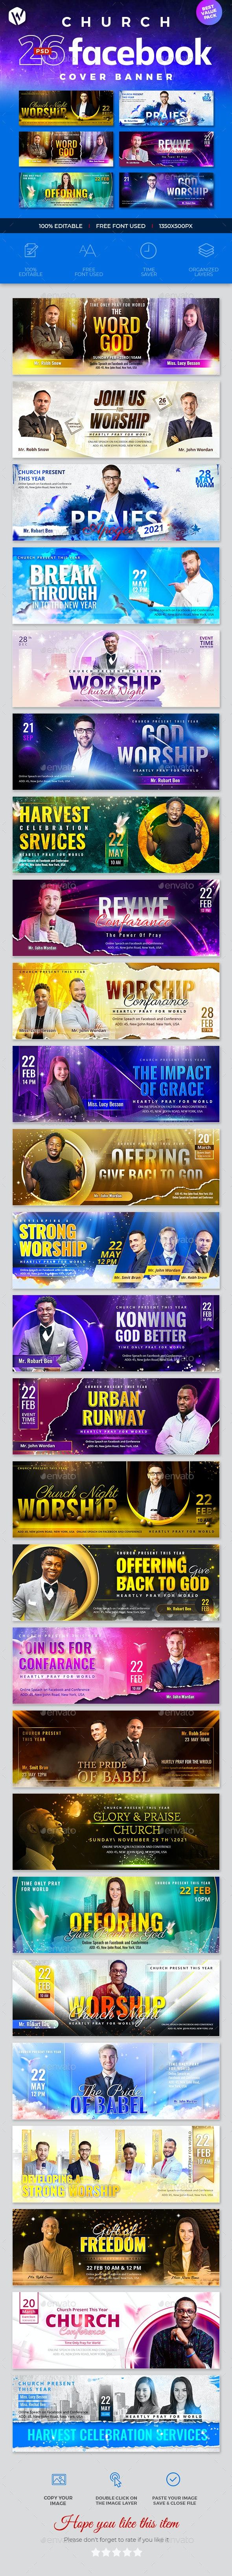 26 Church Facebook Cover Banner - Facebook Timeline Covers Social Media